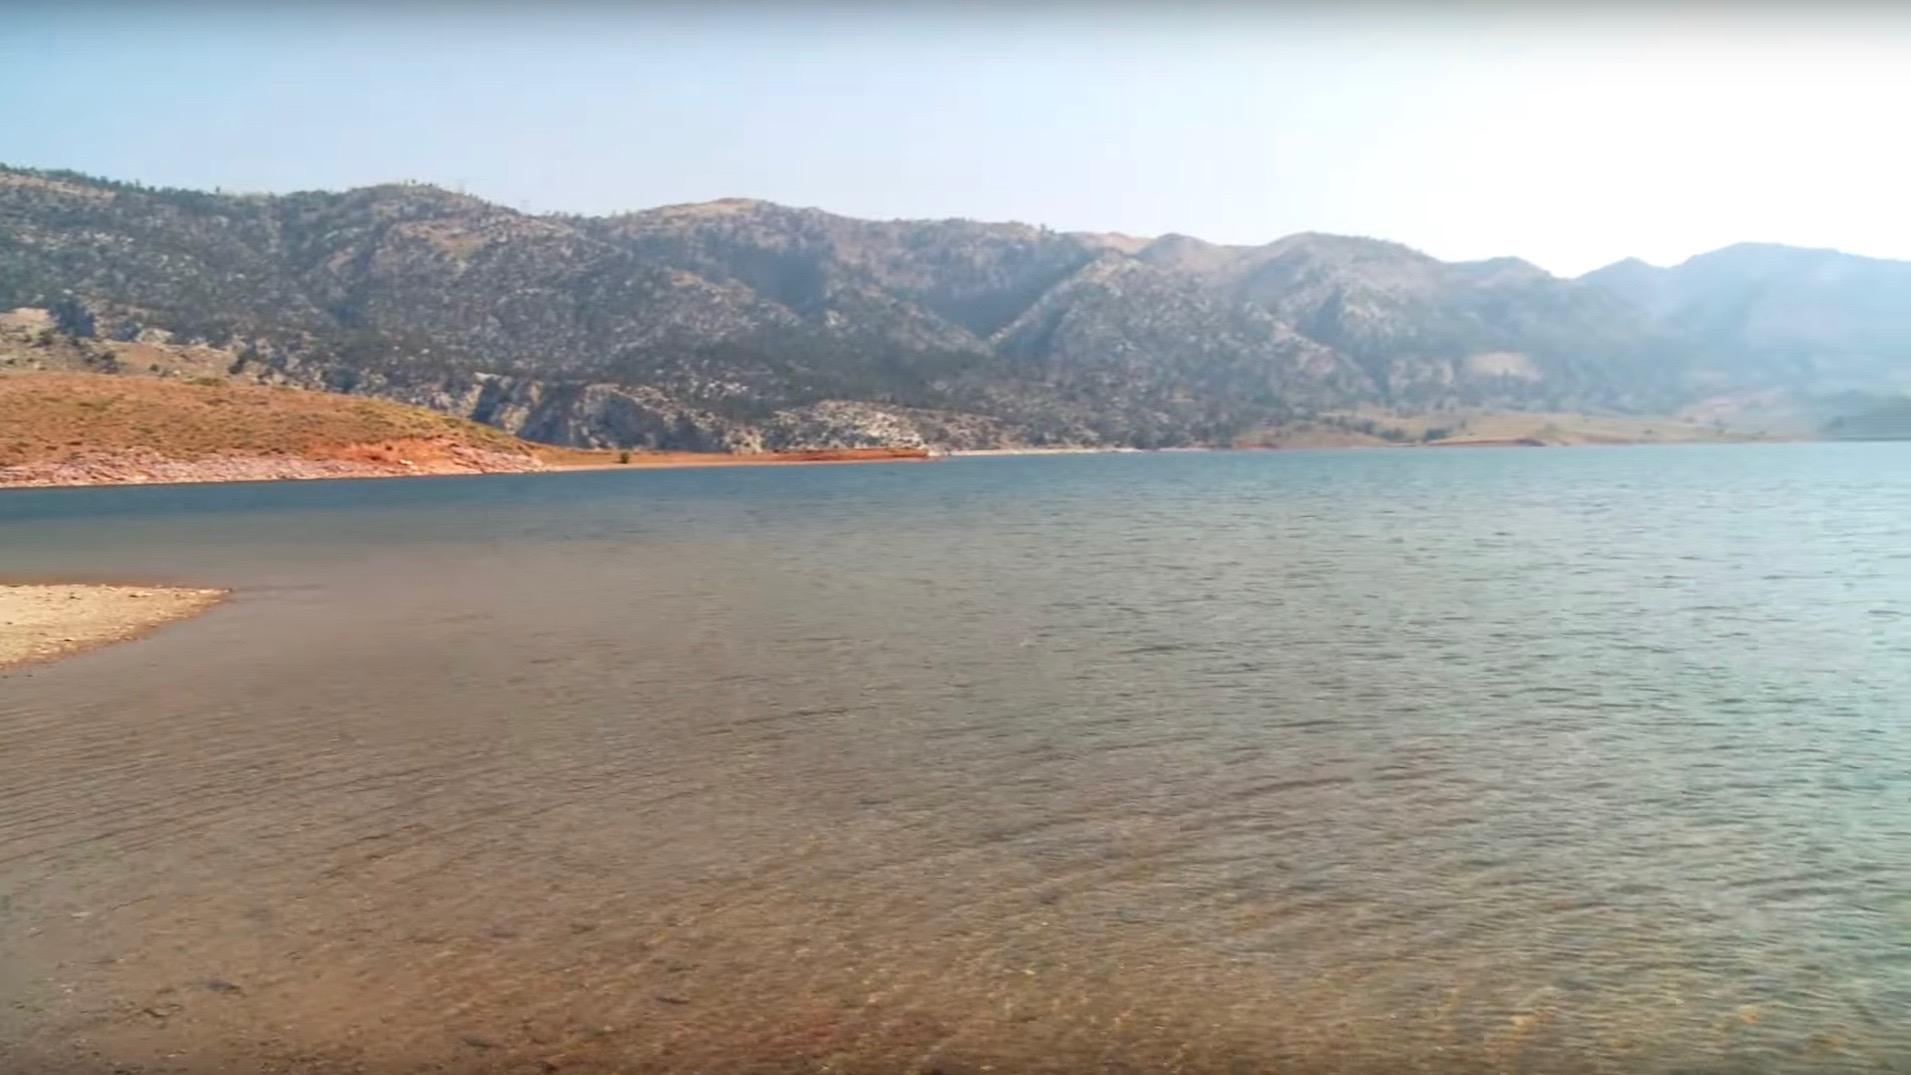 20,000 acres of water on the Seminoe Reservoir